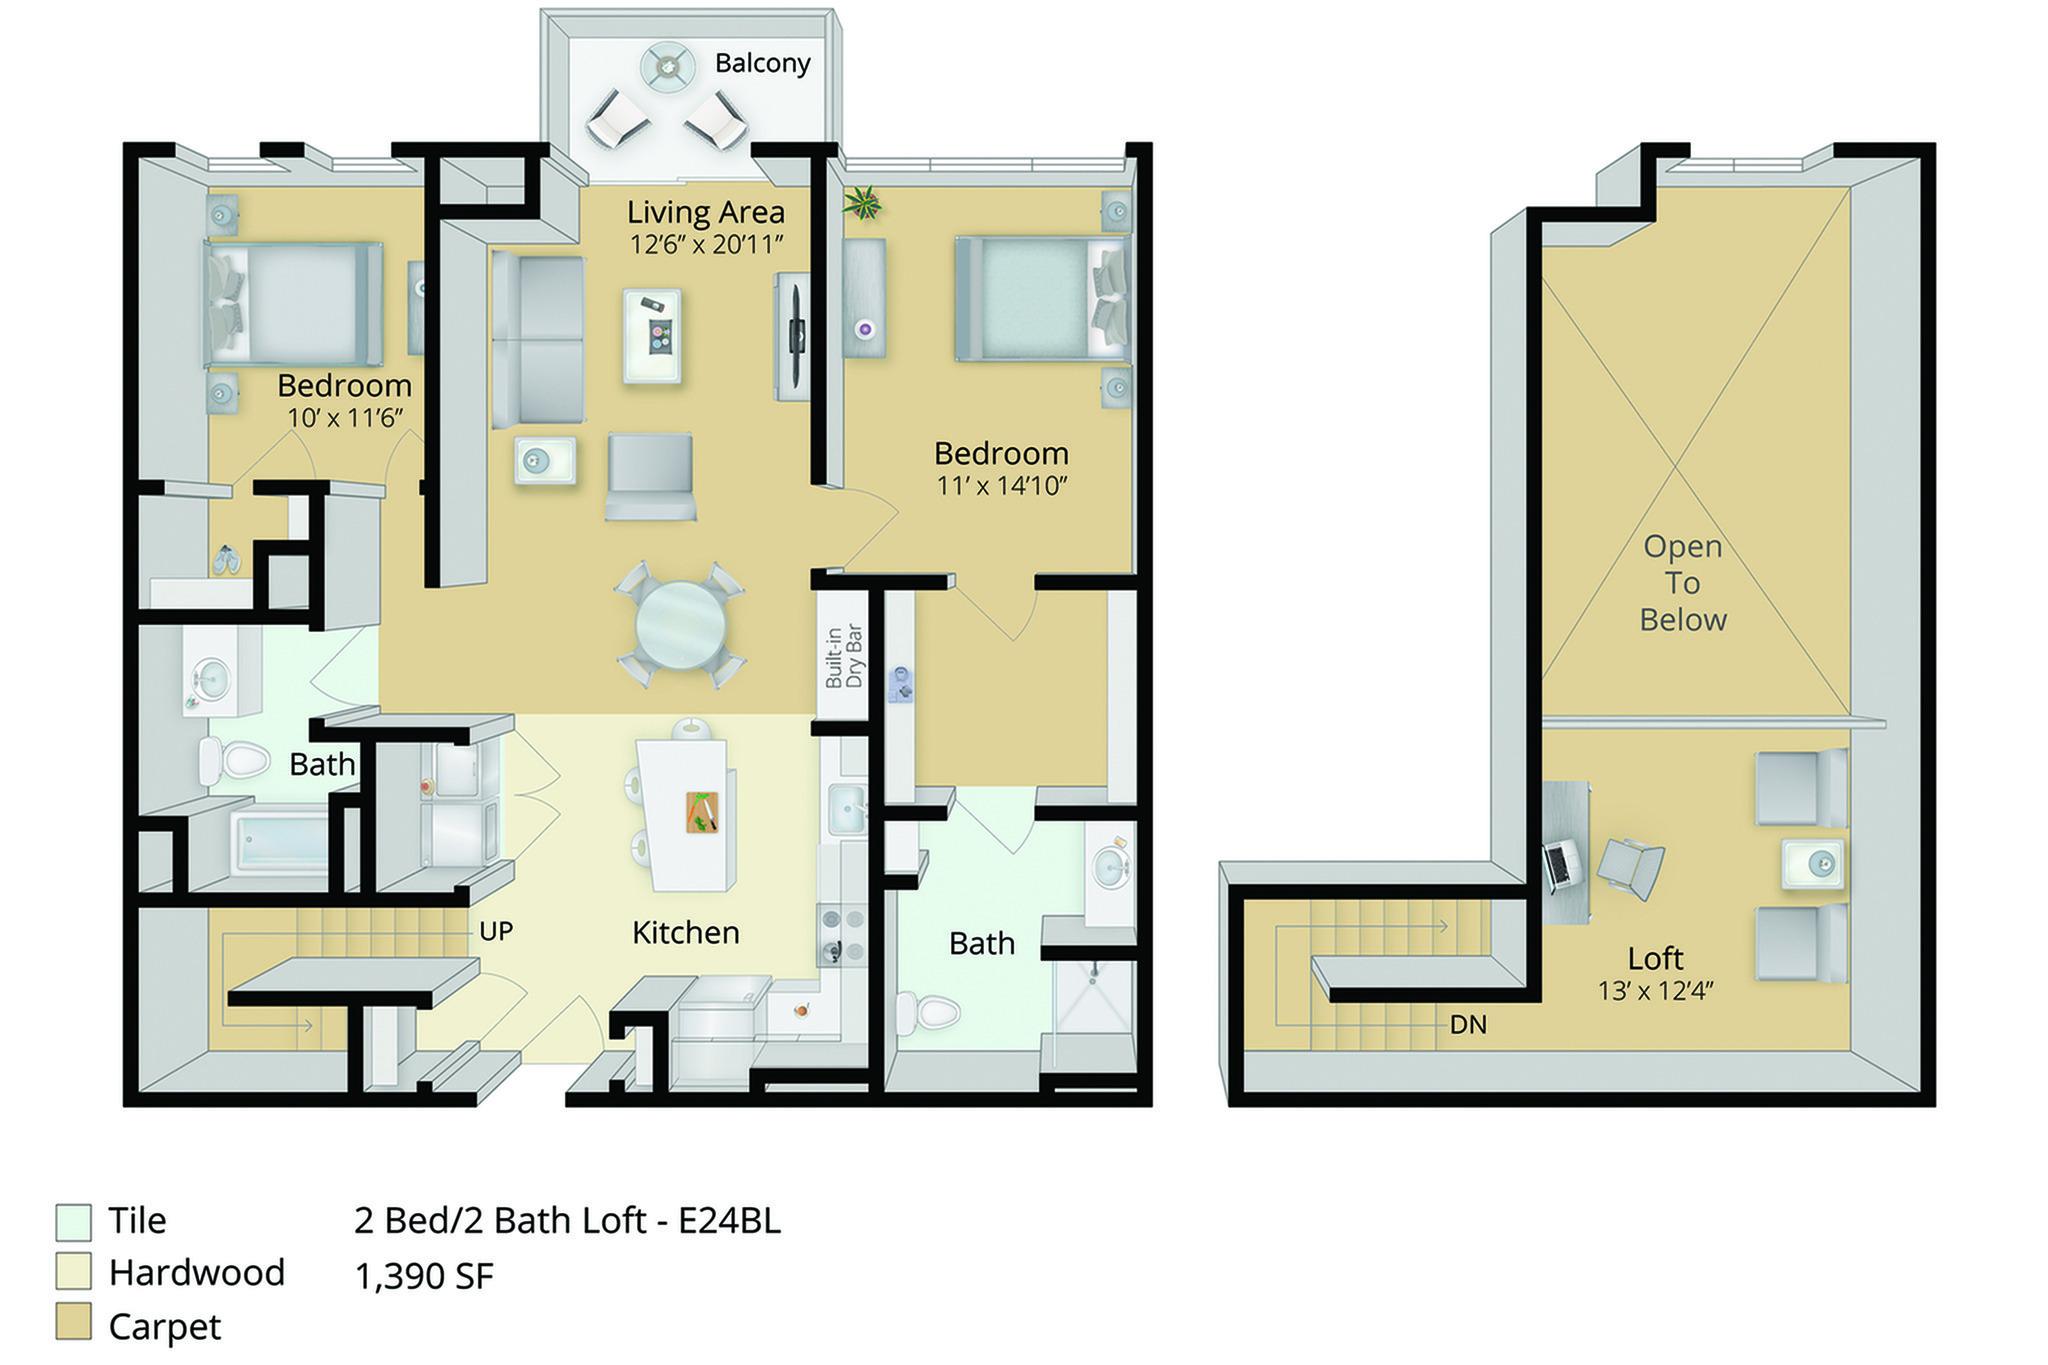 east main apartments - Flooring Plan